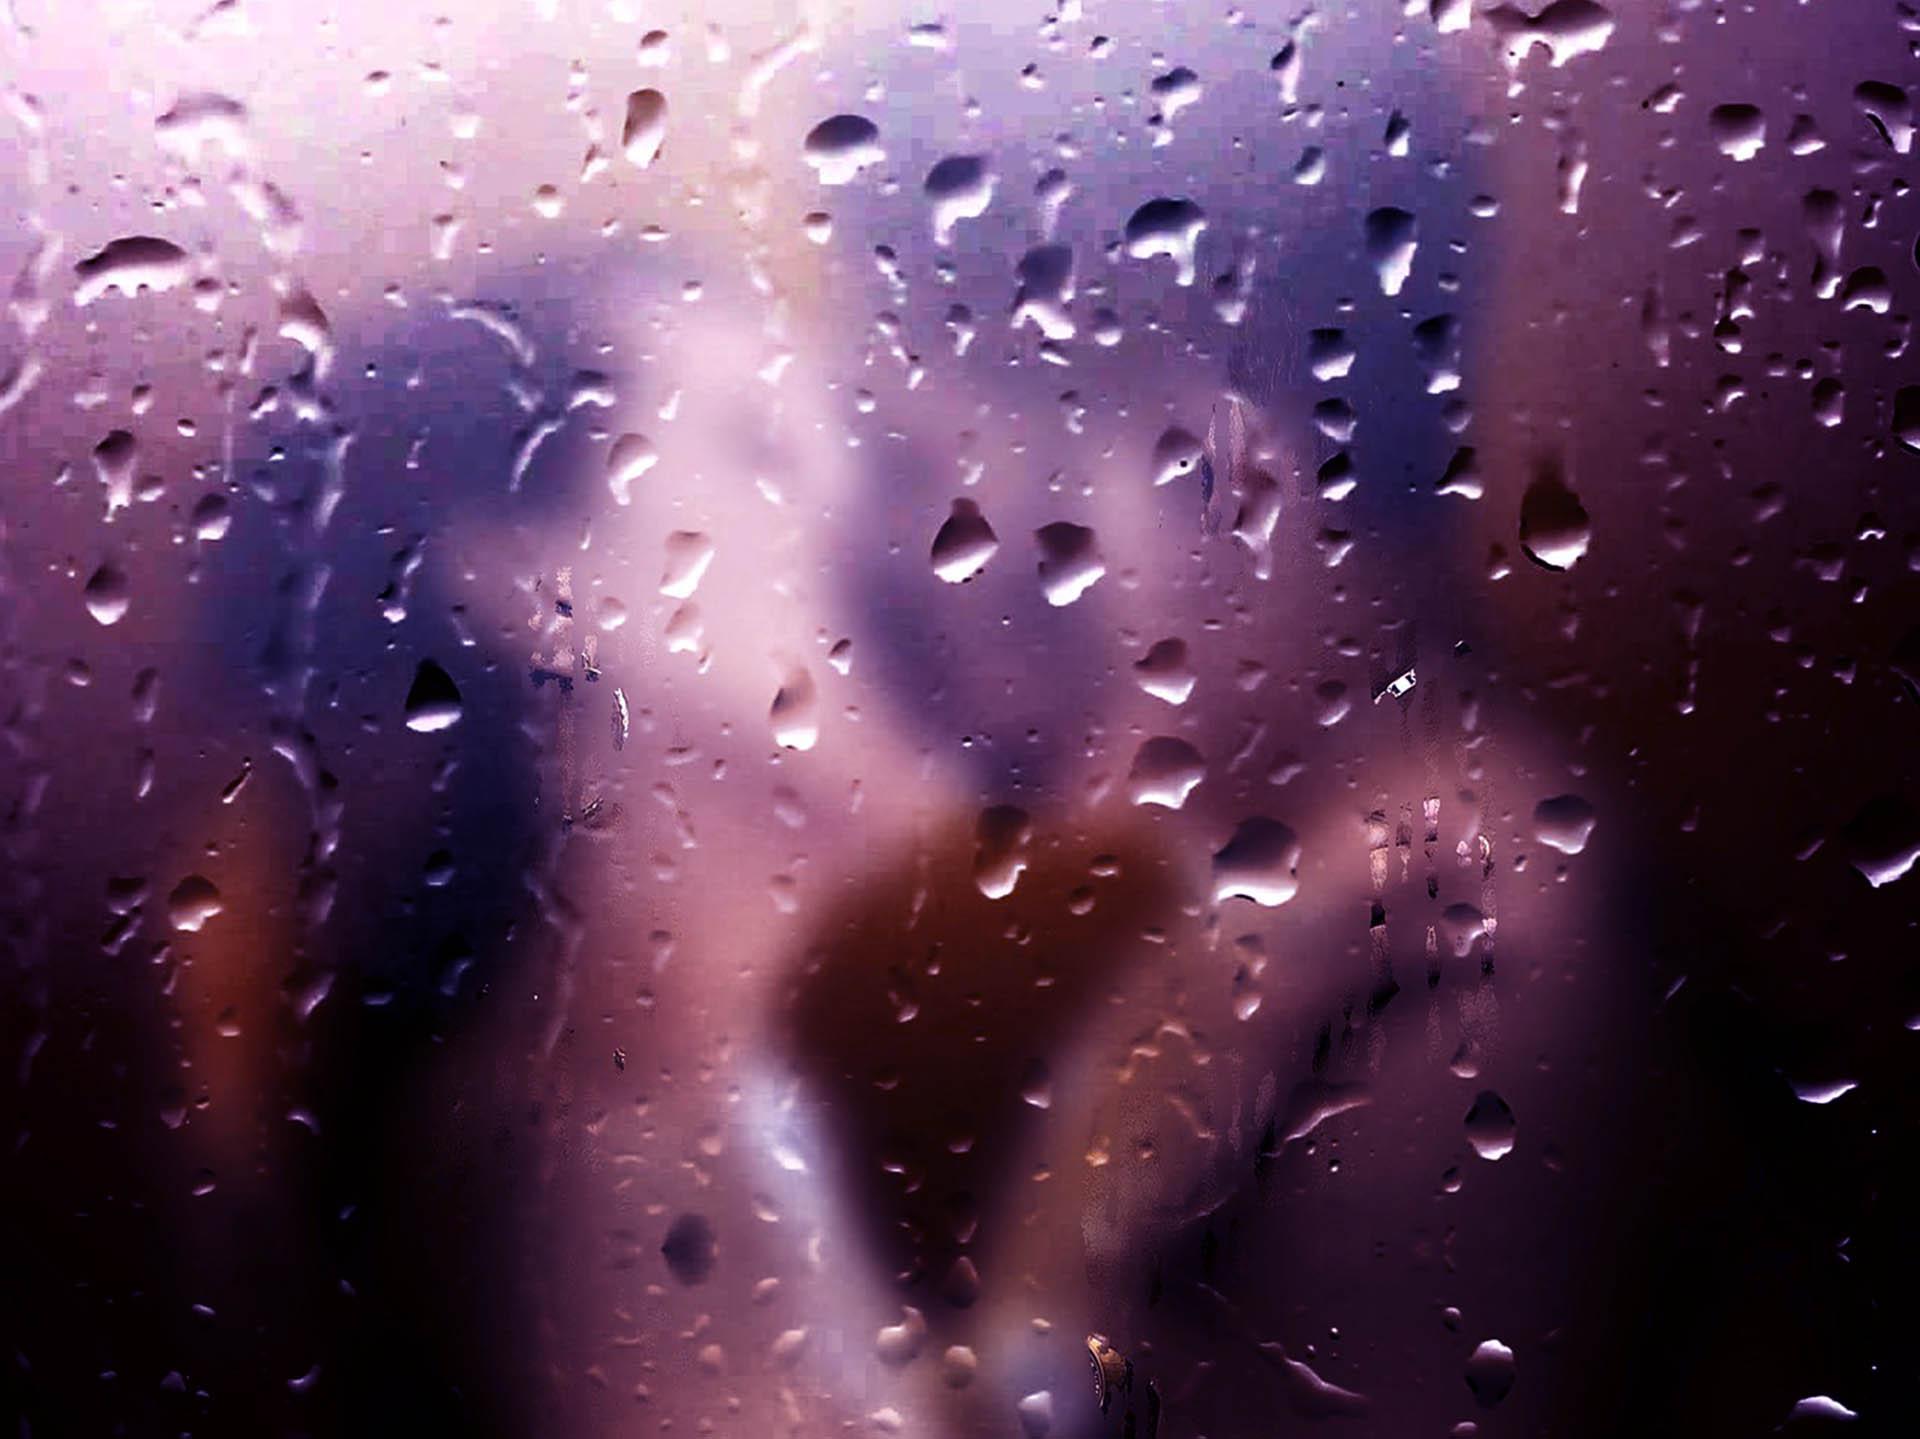 Erotic Image - Lovers